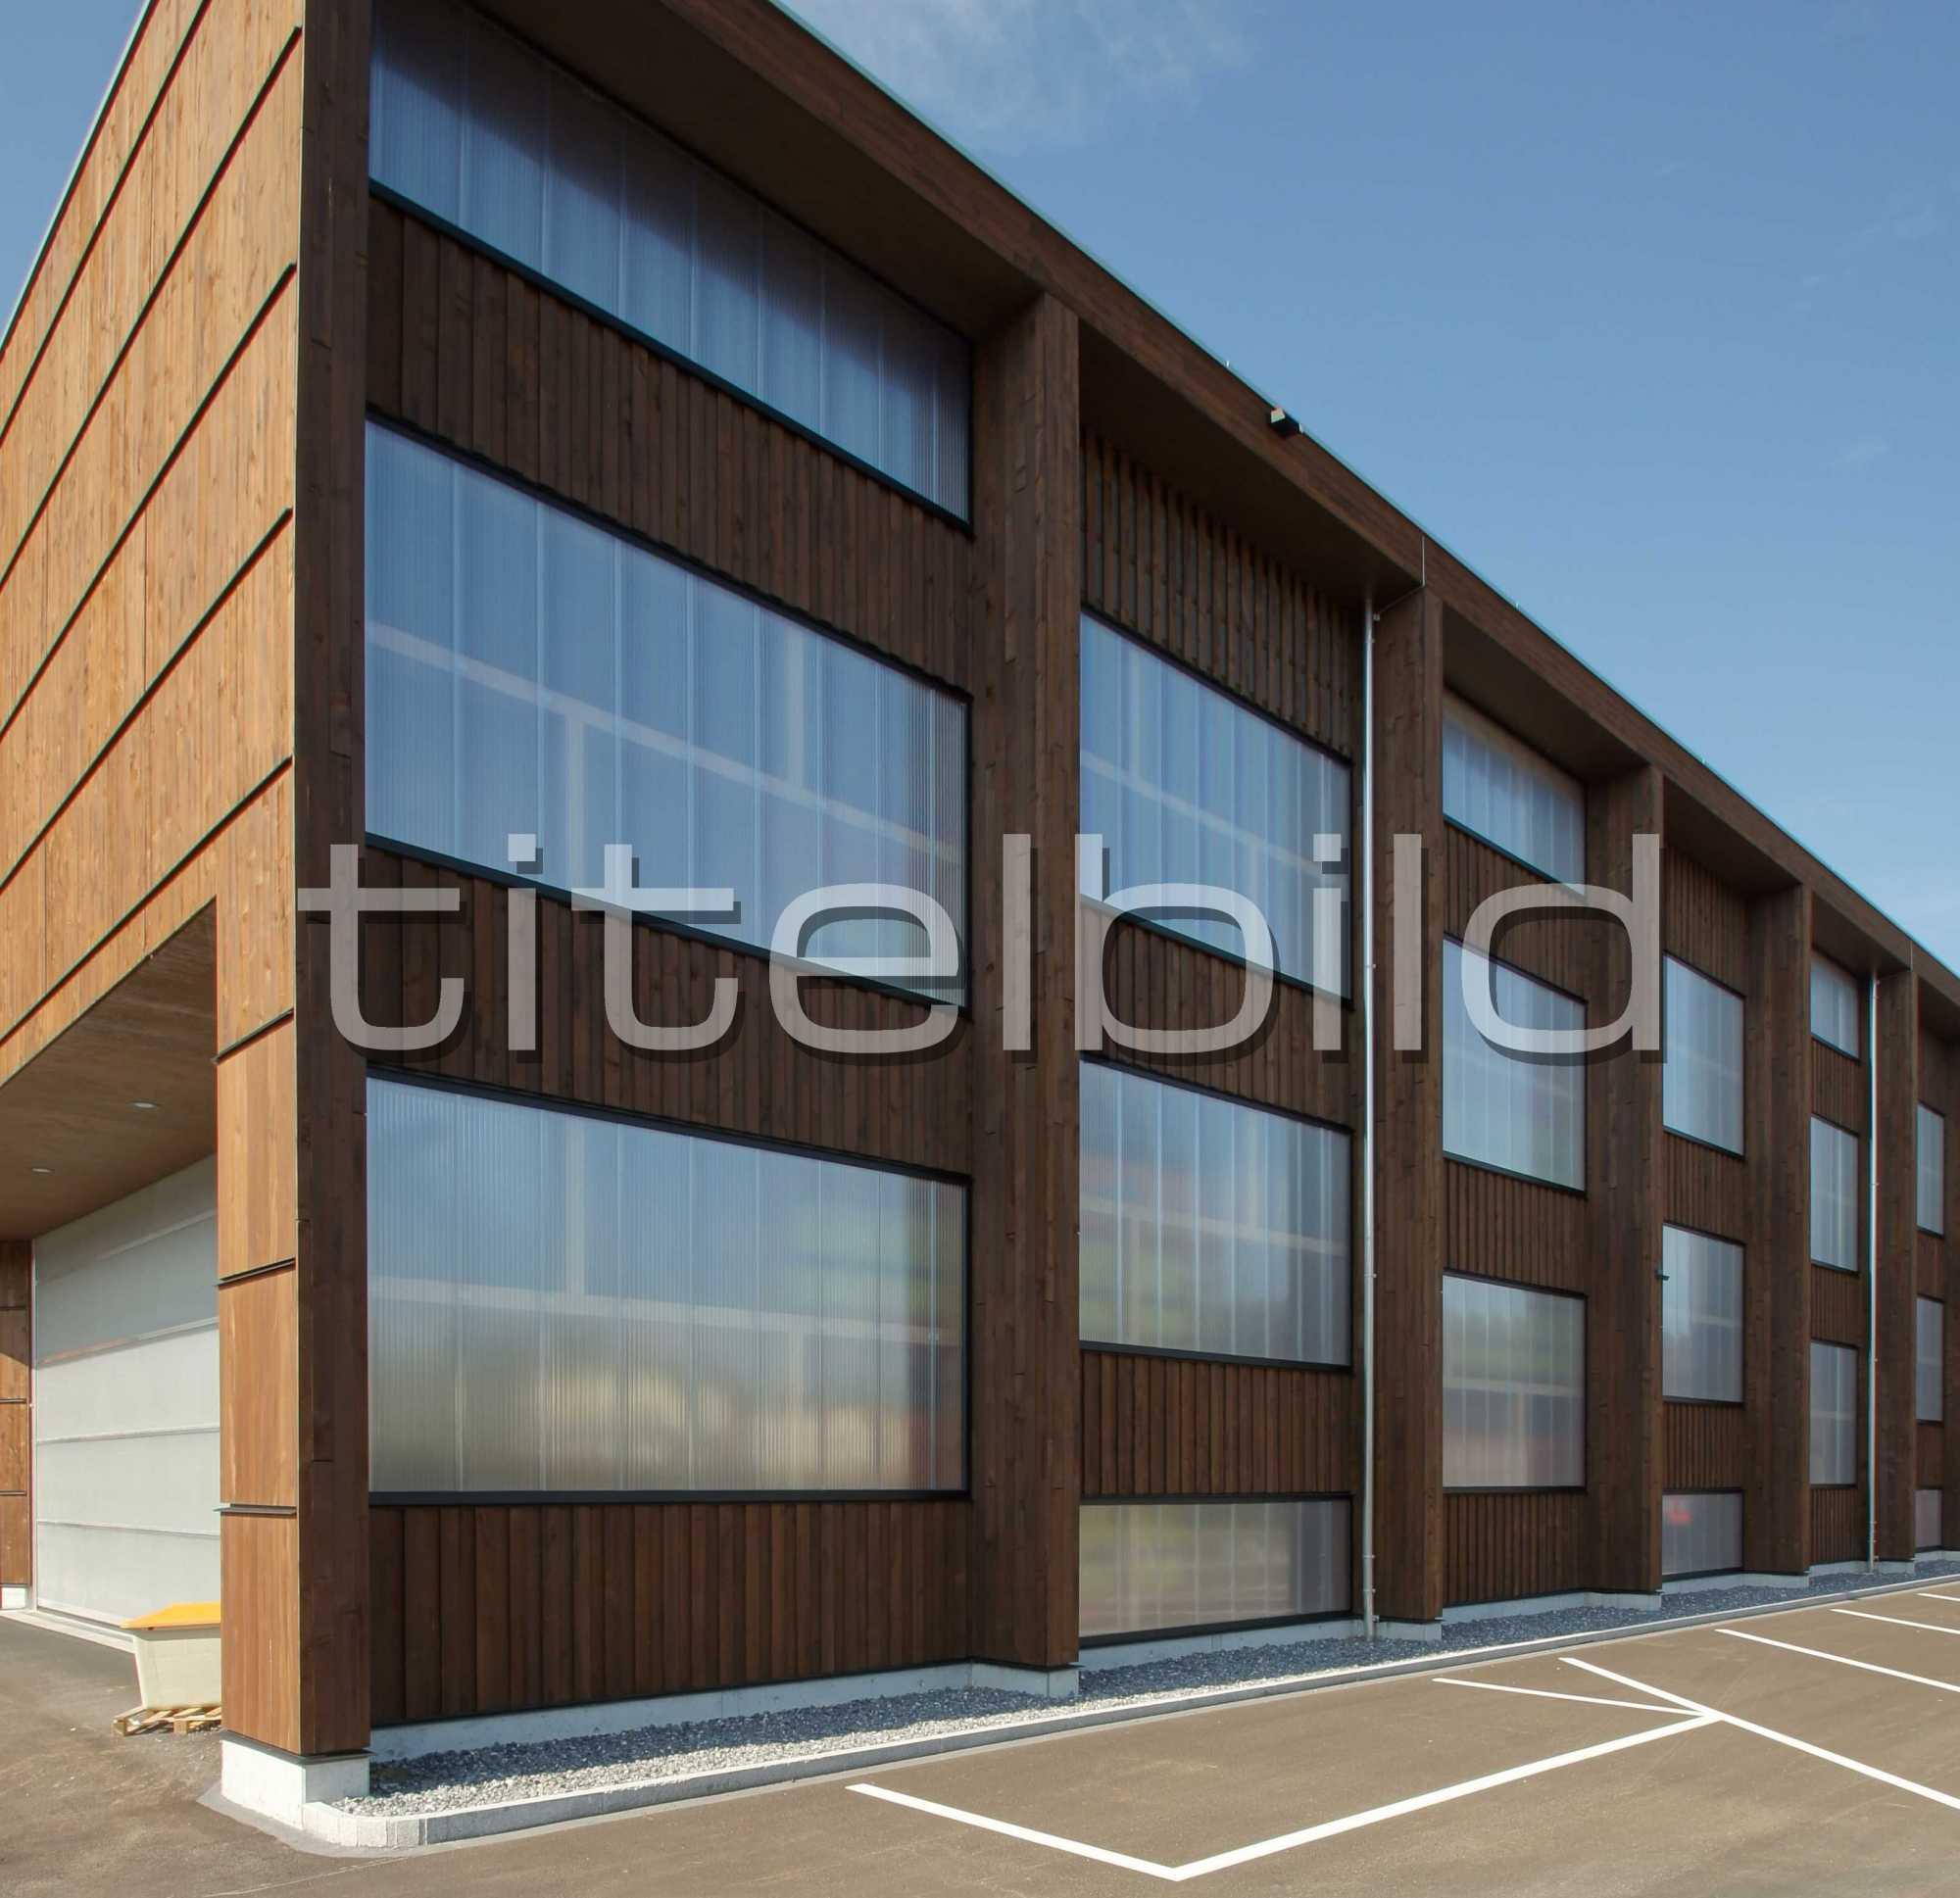 Projektbild-Nr. 4: Autobahn Werkhof Sprengi